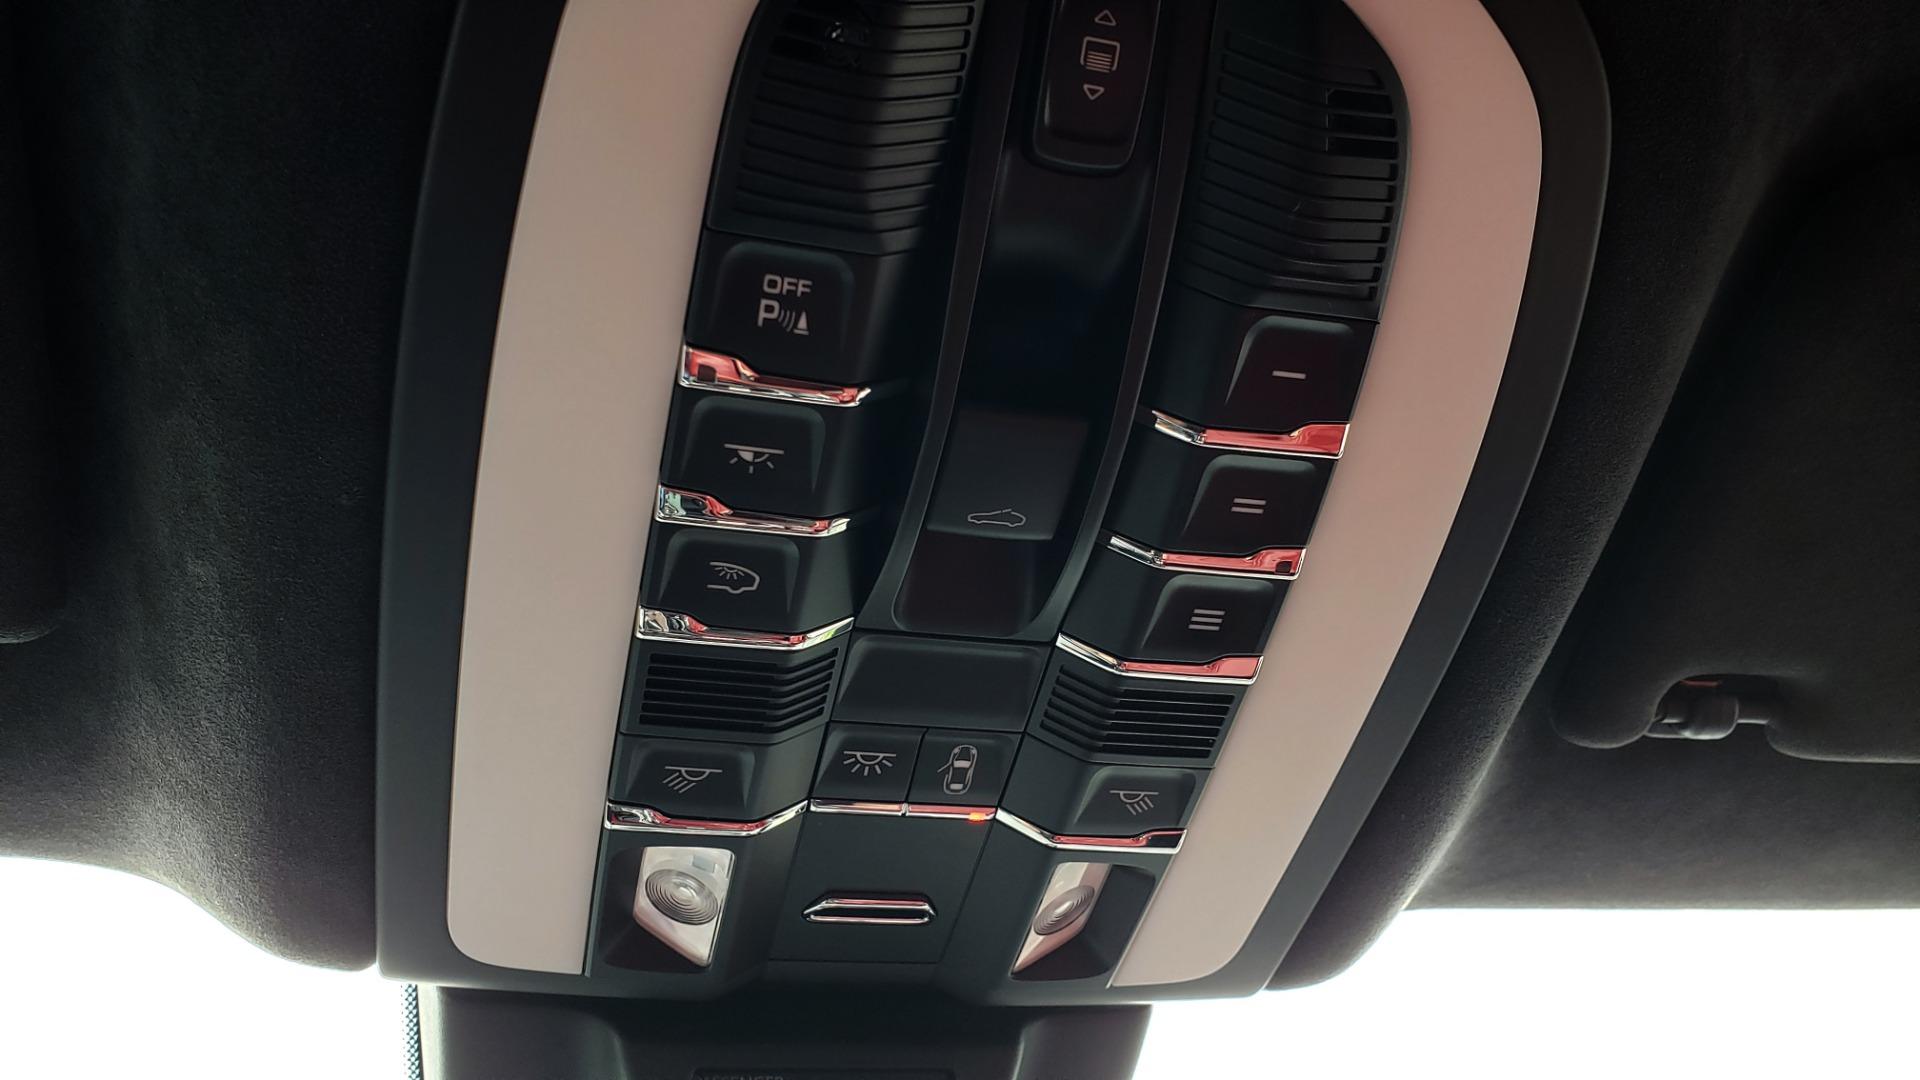 Used 2016 Porsche MACAN TURBO / PREM / NAV / PARK ASST / BOSE / PDK / CHRONO PKG for sale Sold at Formula Imports in Charlotte NC 28227 60